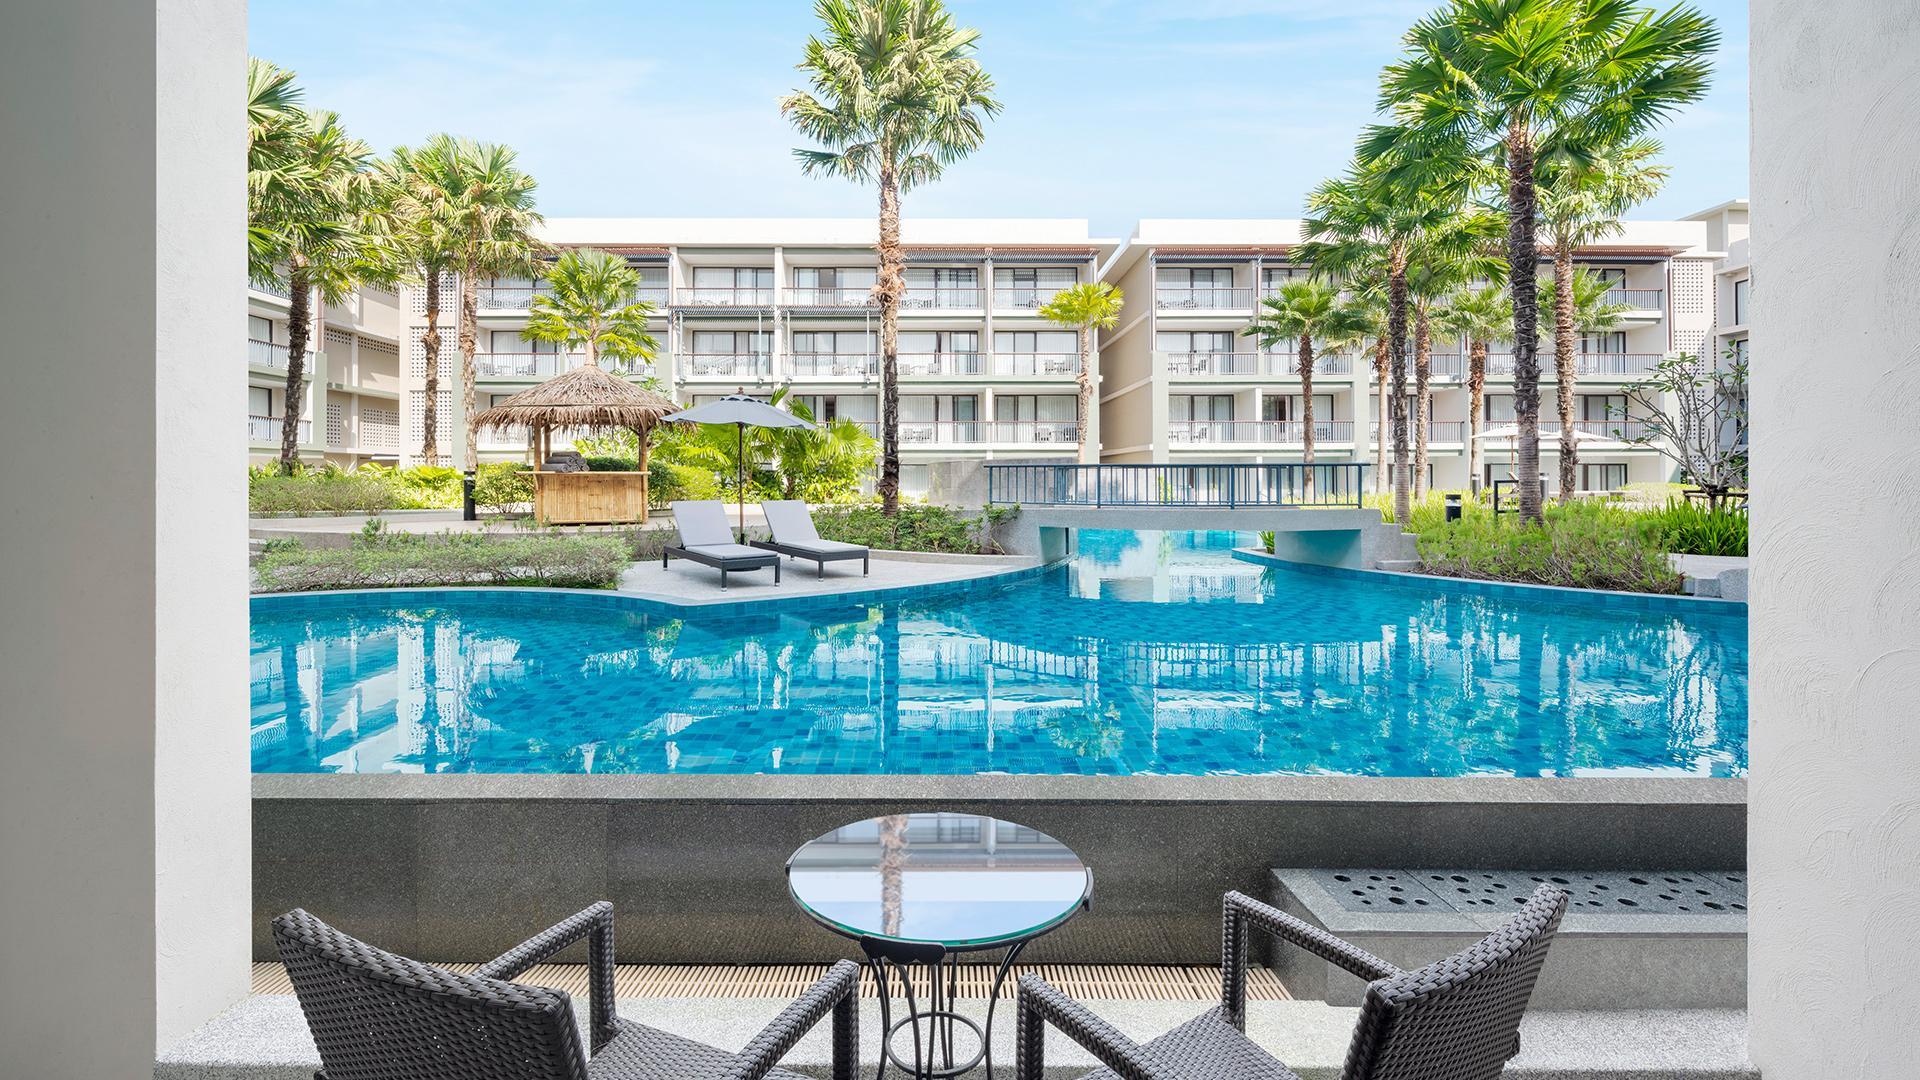 Superior Pool Access Room image 1 at Le Méridien Khao Lak Resort & Spa by Amphoe Takua Pa, Chang Wat Phang-nga, Thailand